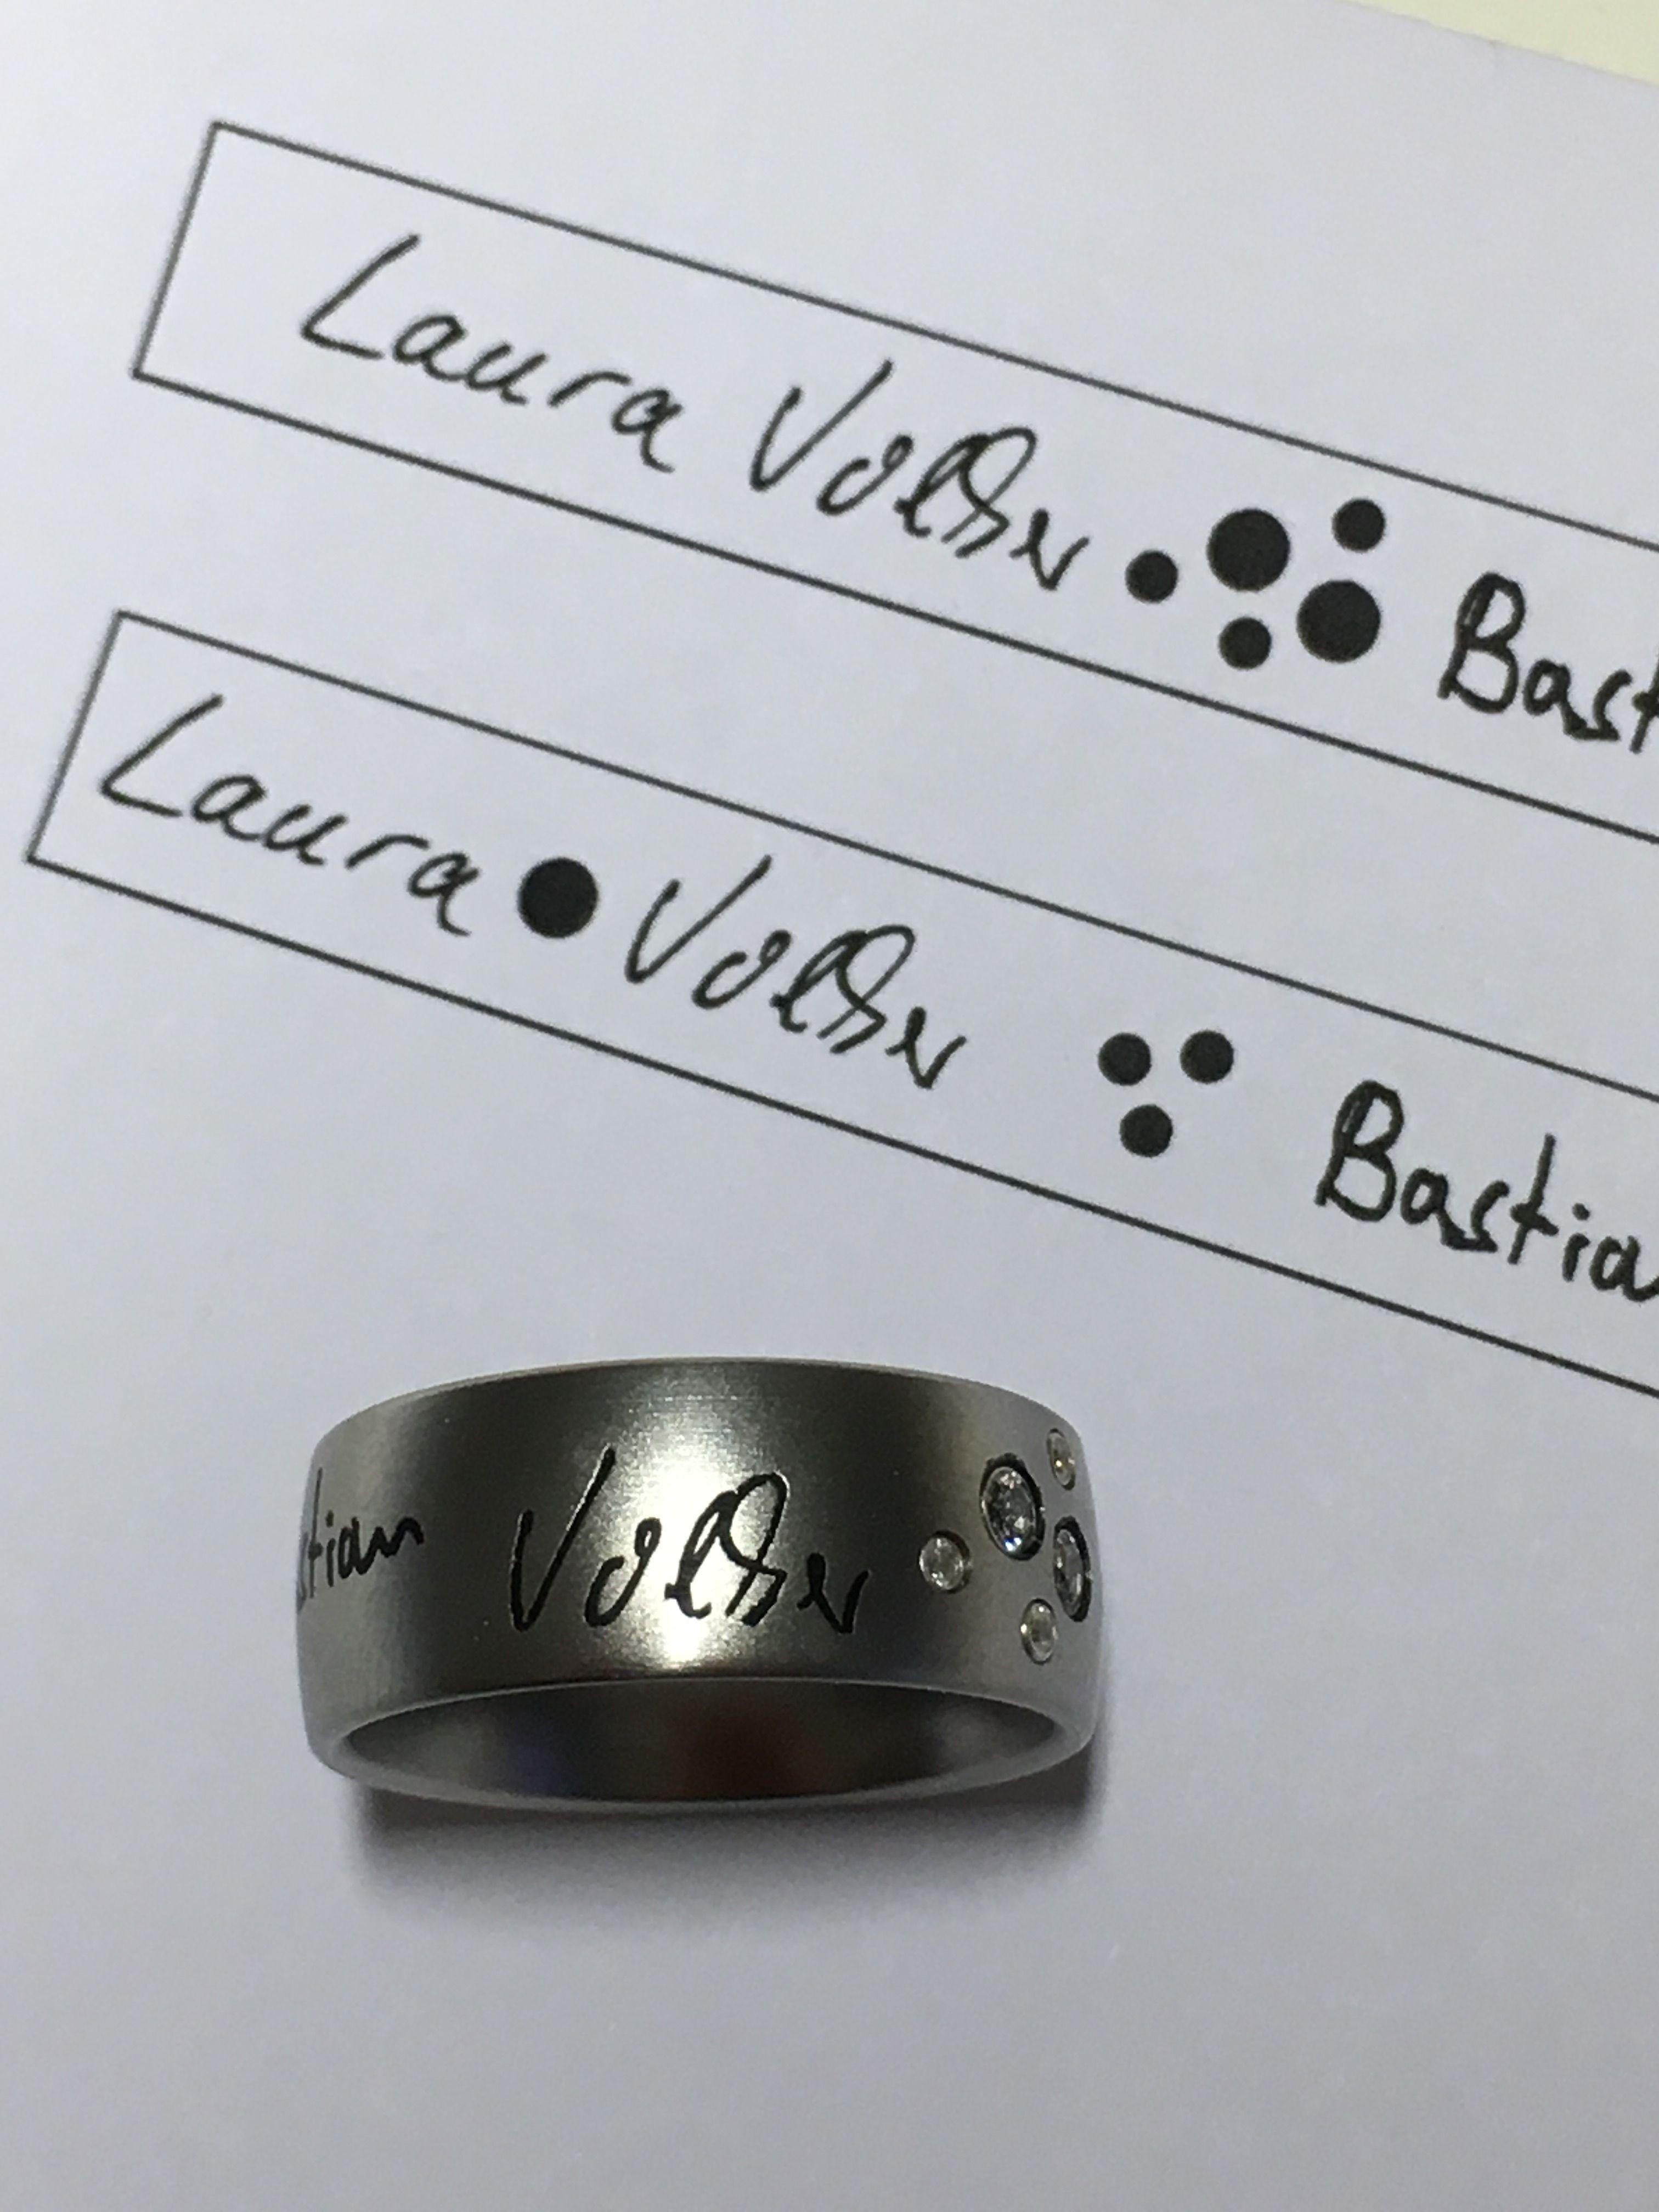 Edelstahl-Gliederarmband mit Namen in Lasergravur Laura